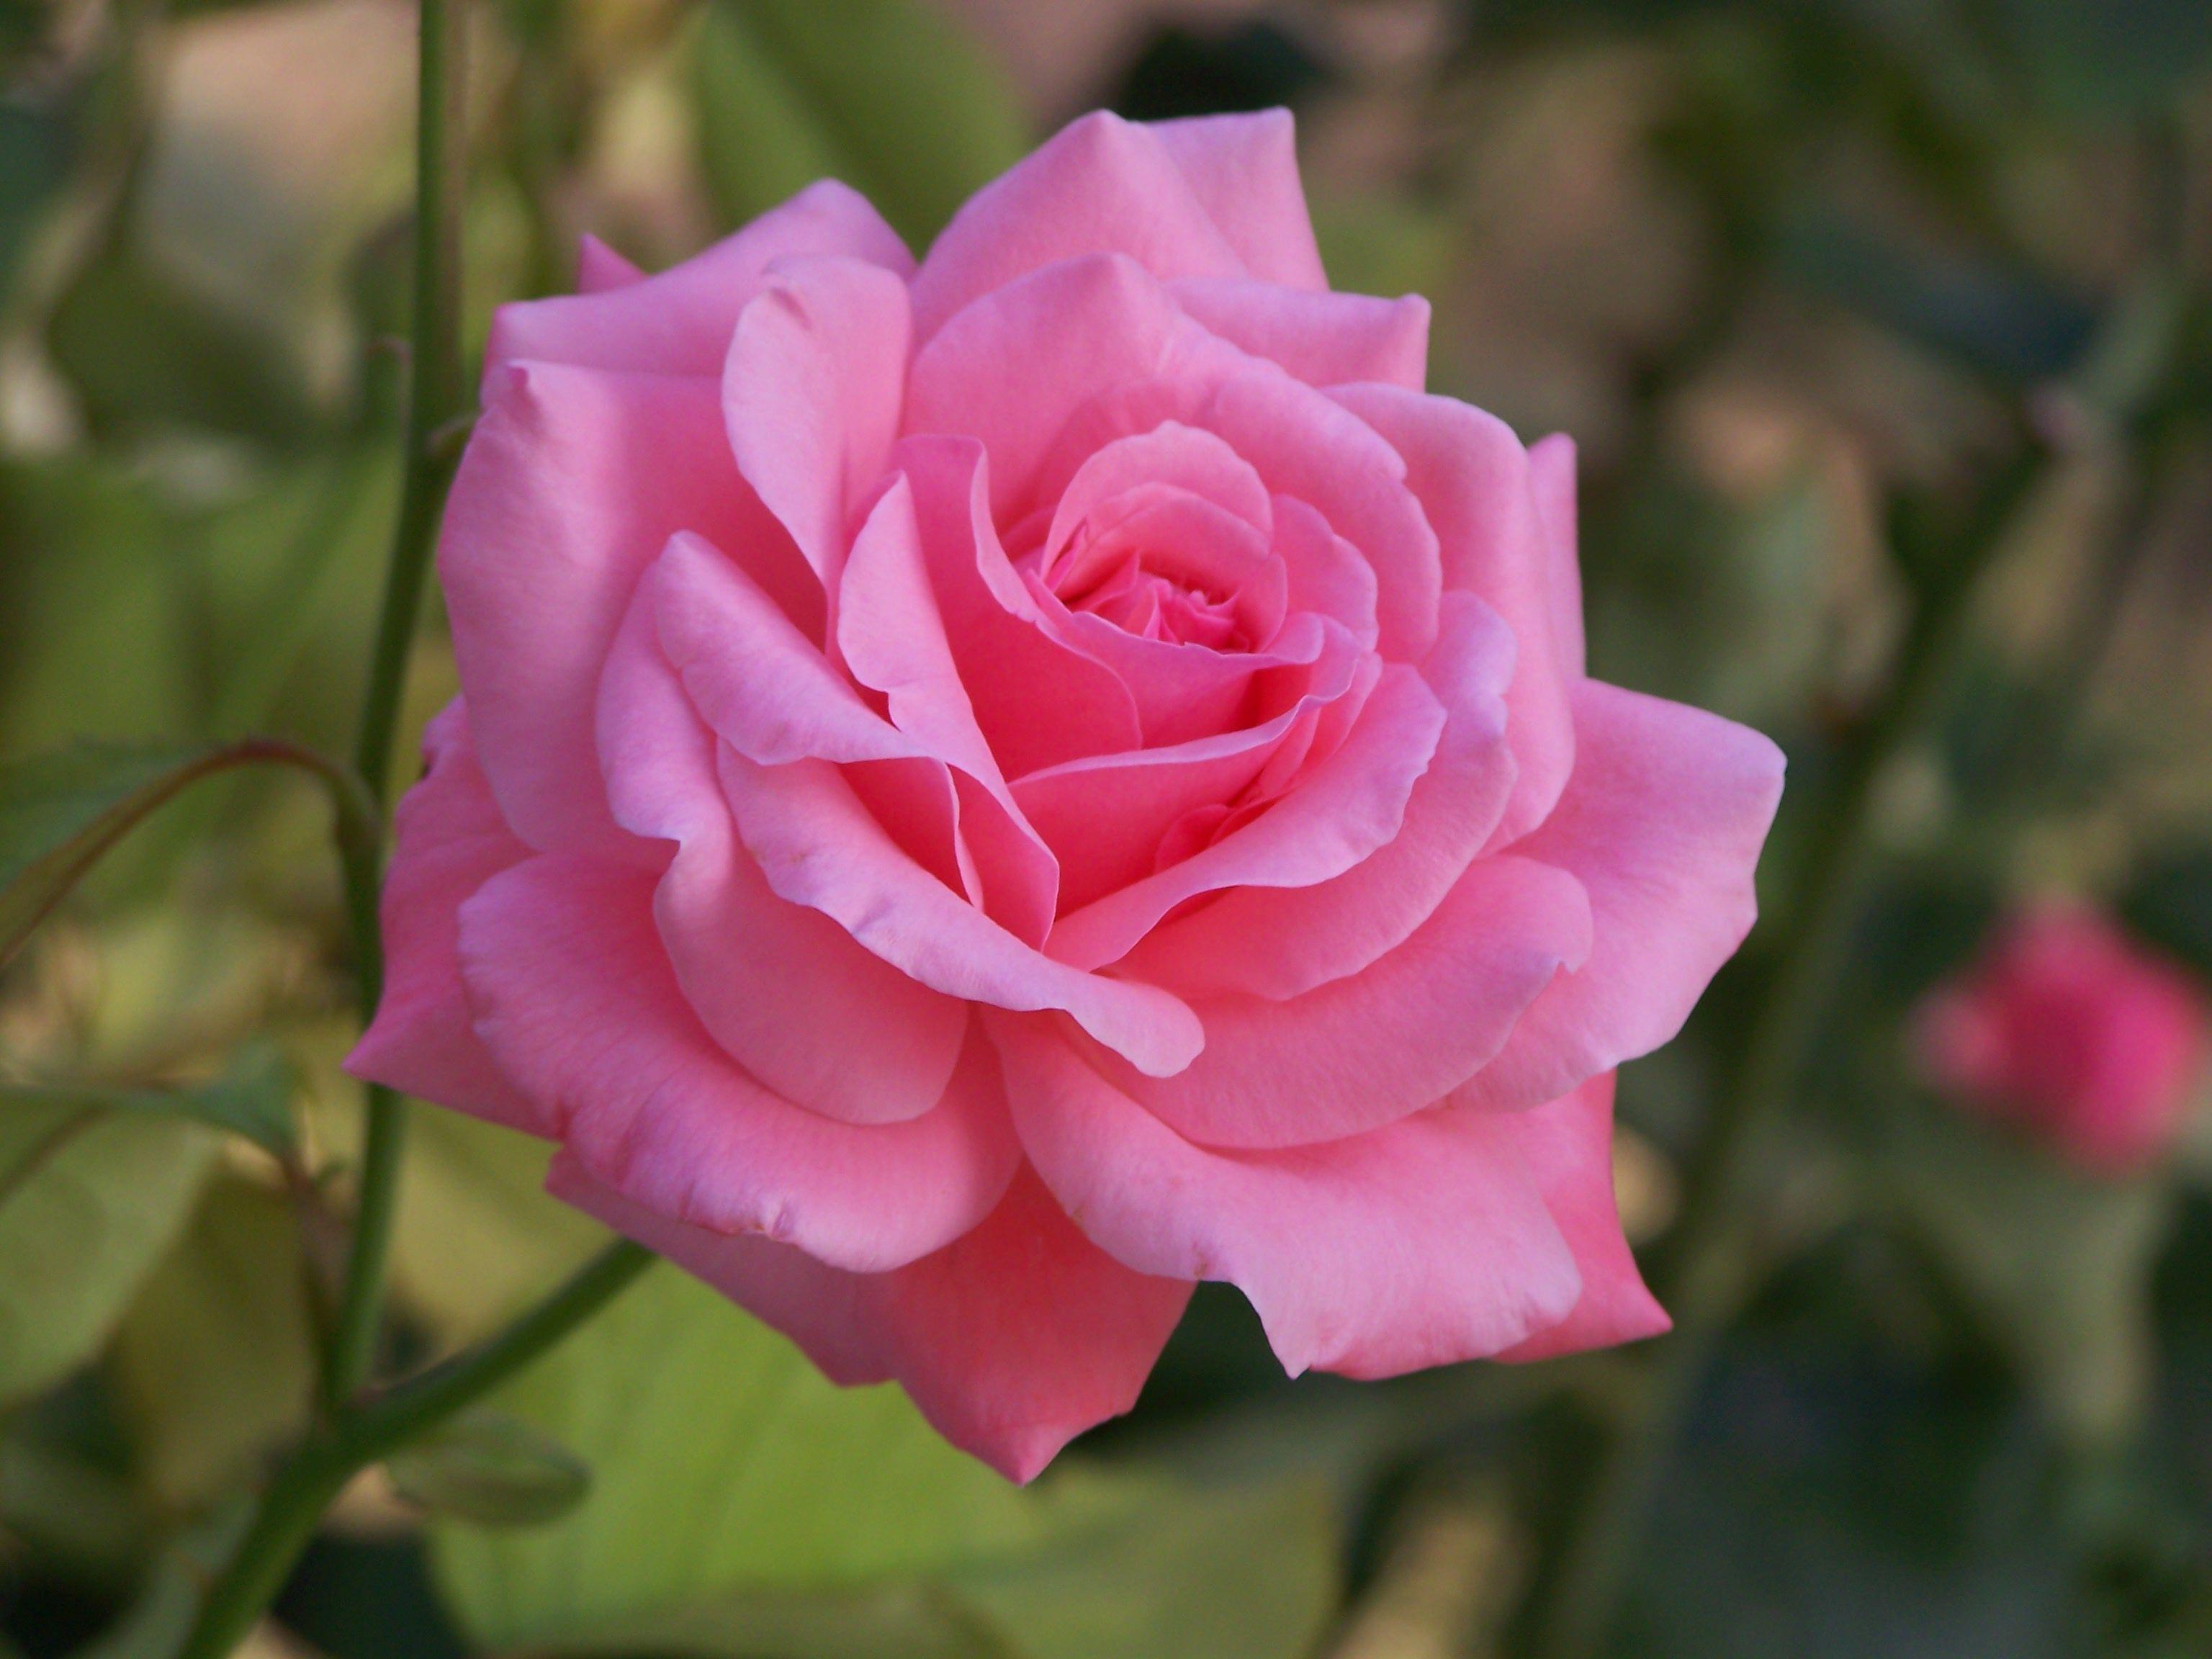 ♥GK♥ 46 ROSE Top 10 Best Smelling Flowers HAPPY BIRTHDAY GARY KING